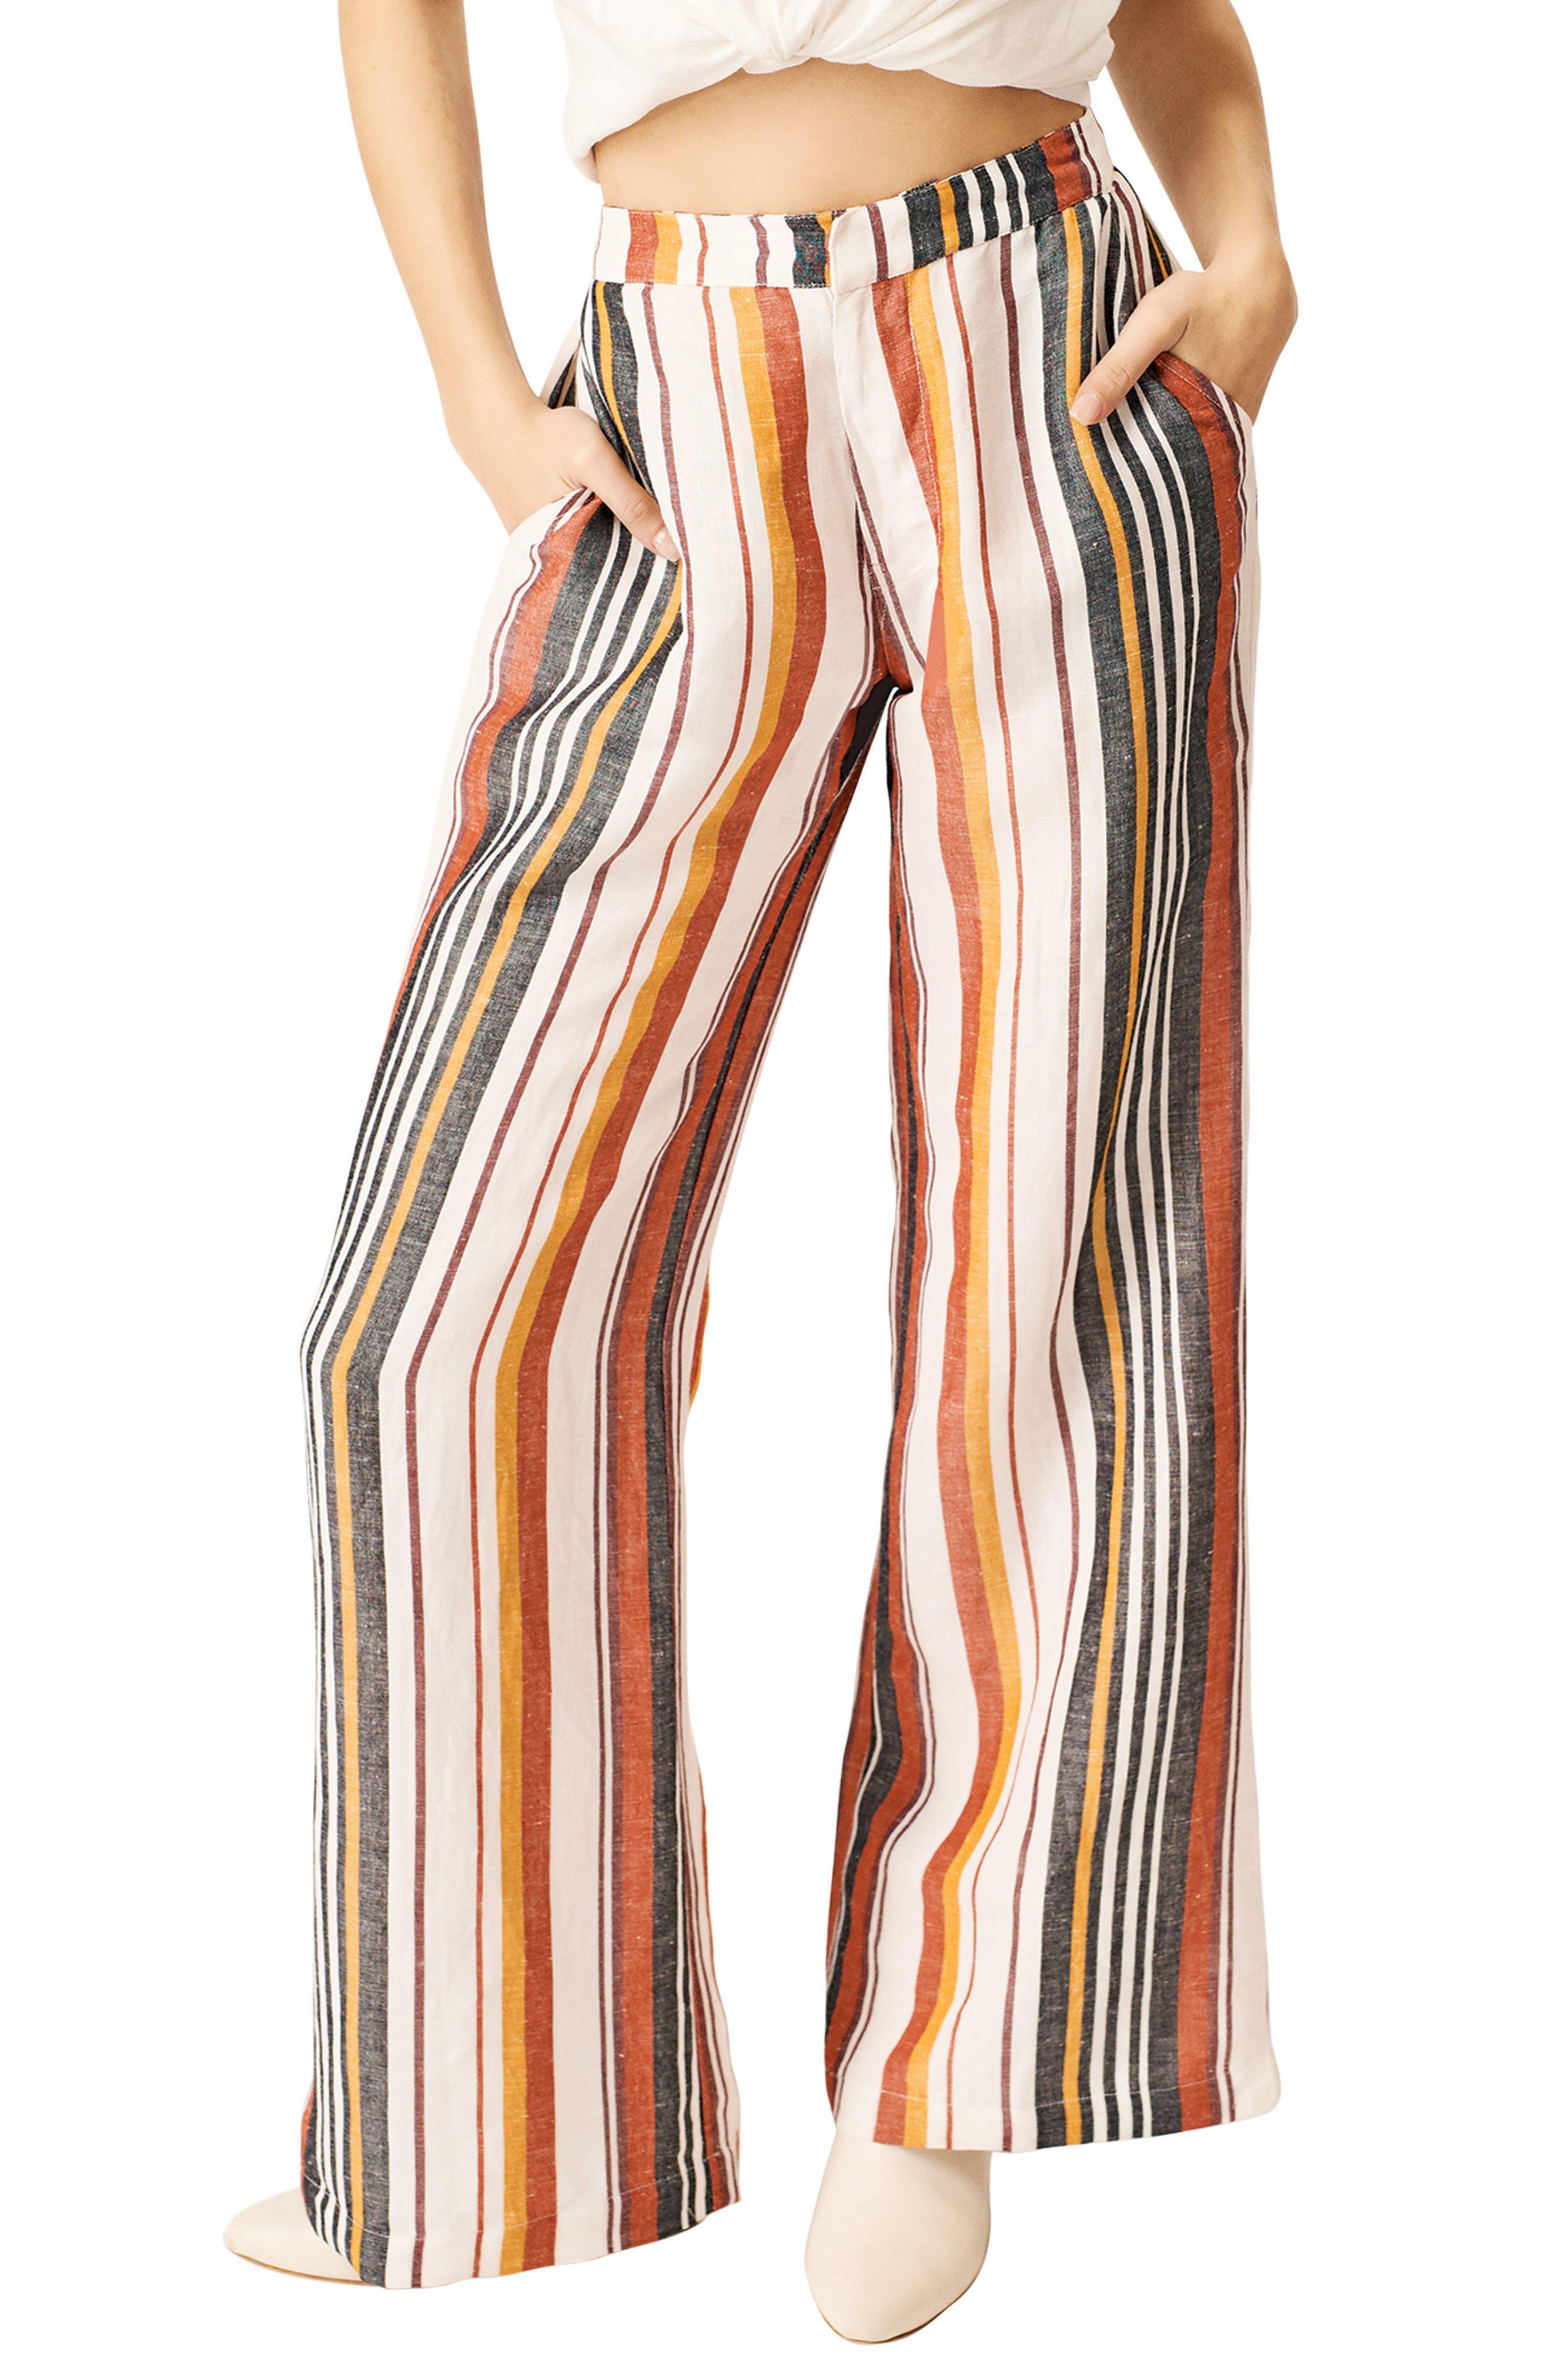 Hook It Up Stripe Pants,                             Main thumbnail 1, color,                             MULTI